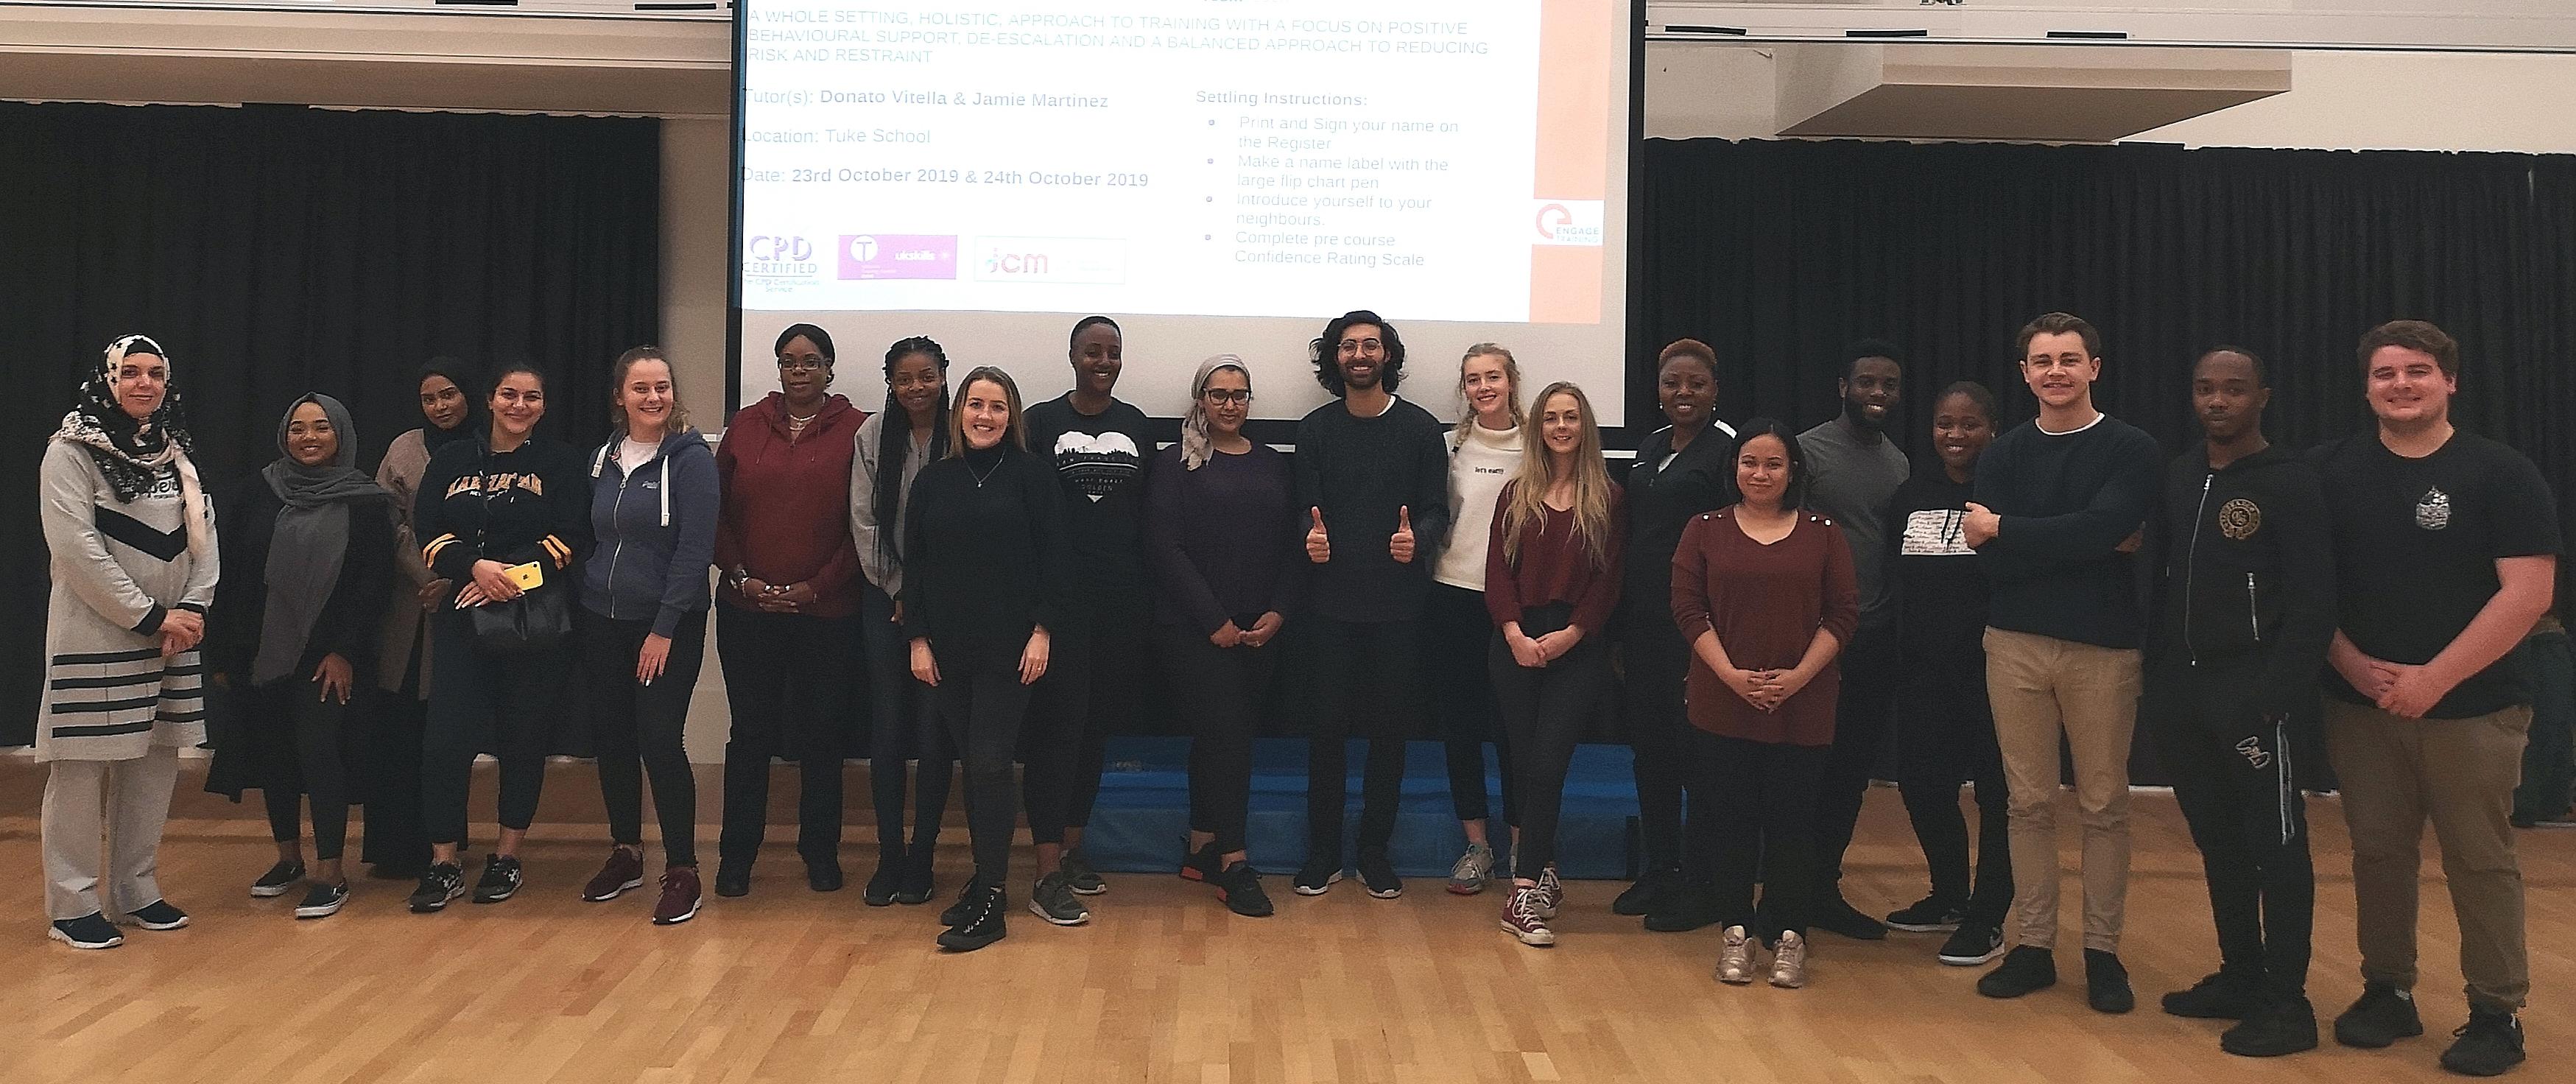 Team Teach - October 2019